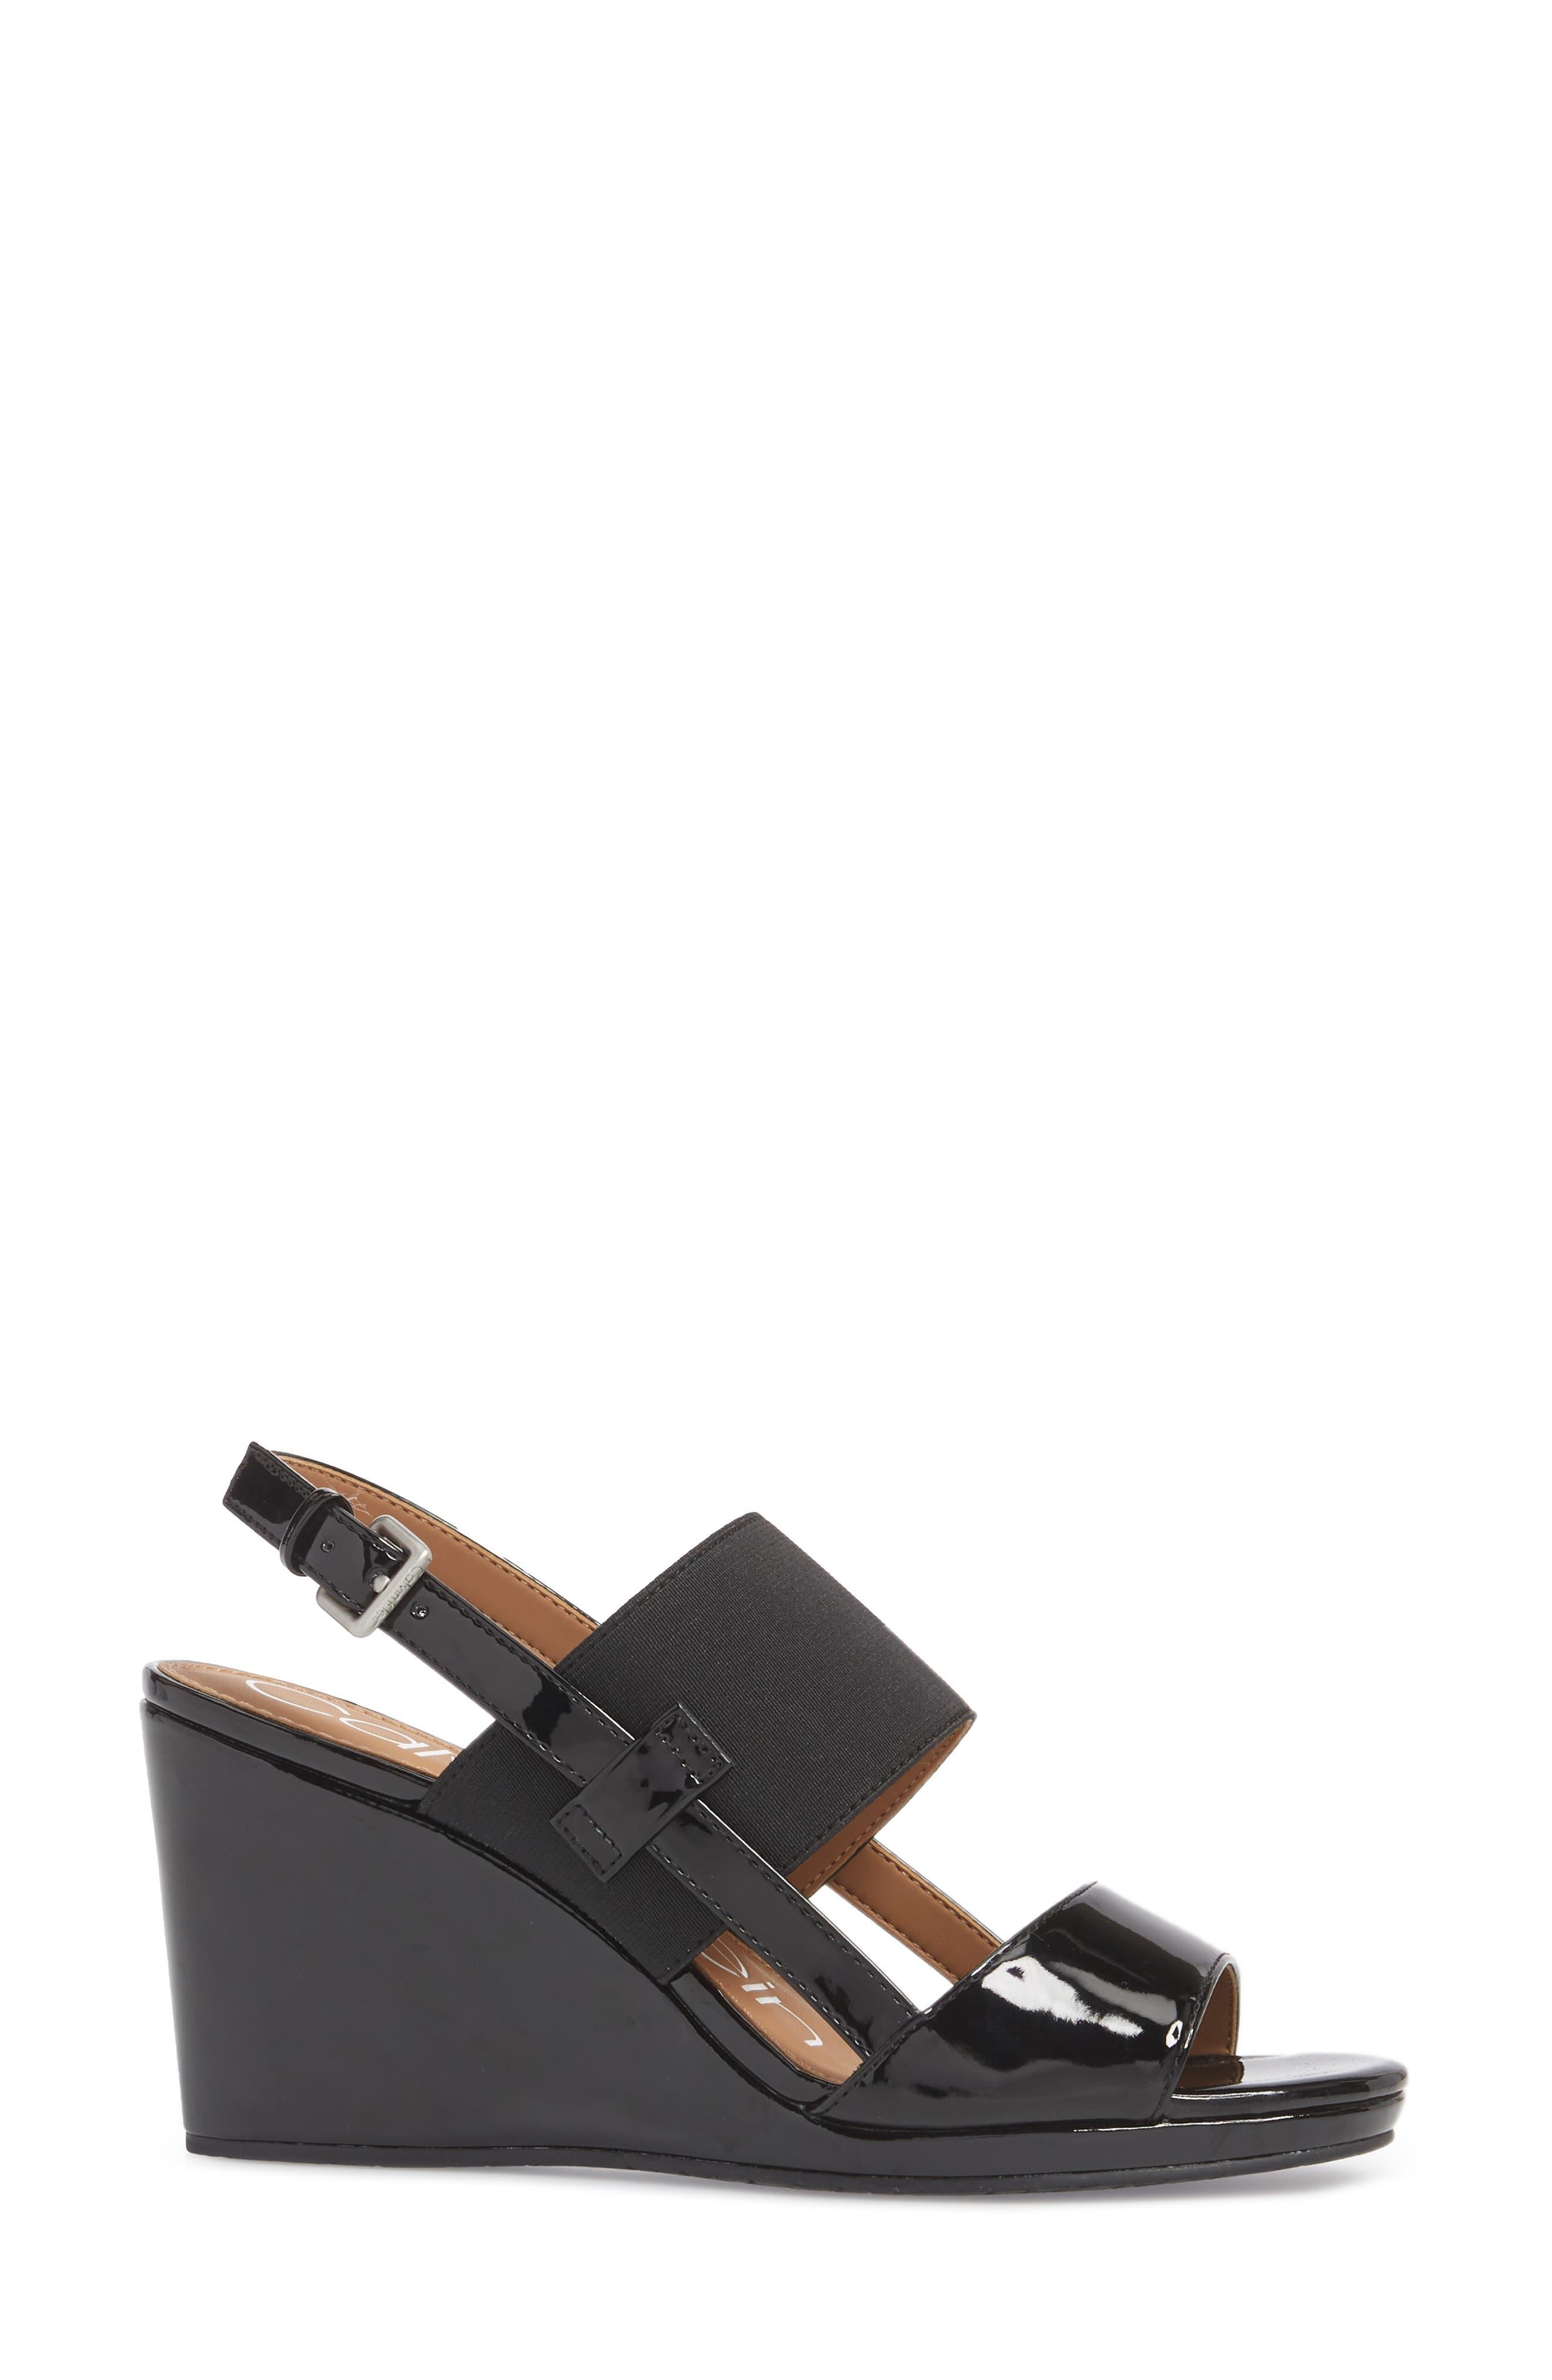 Bethan Wedge Sandal,                             Alternate thumbnail 3, color,                             Black Patent